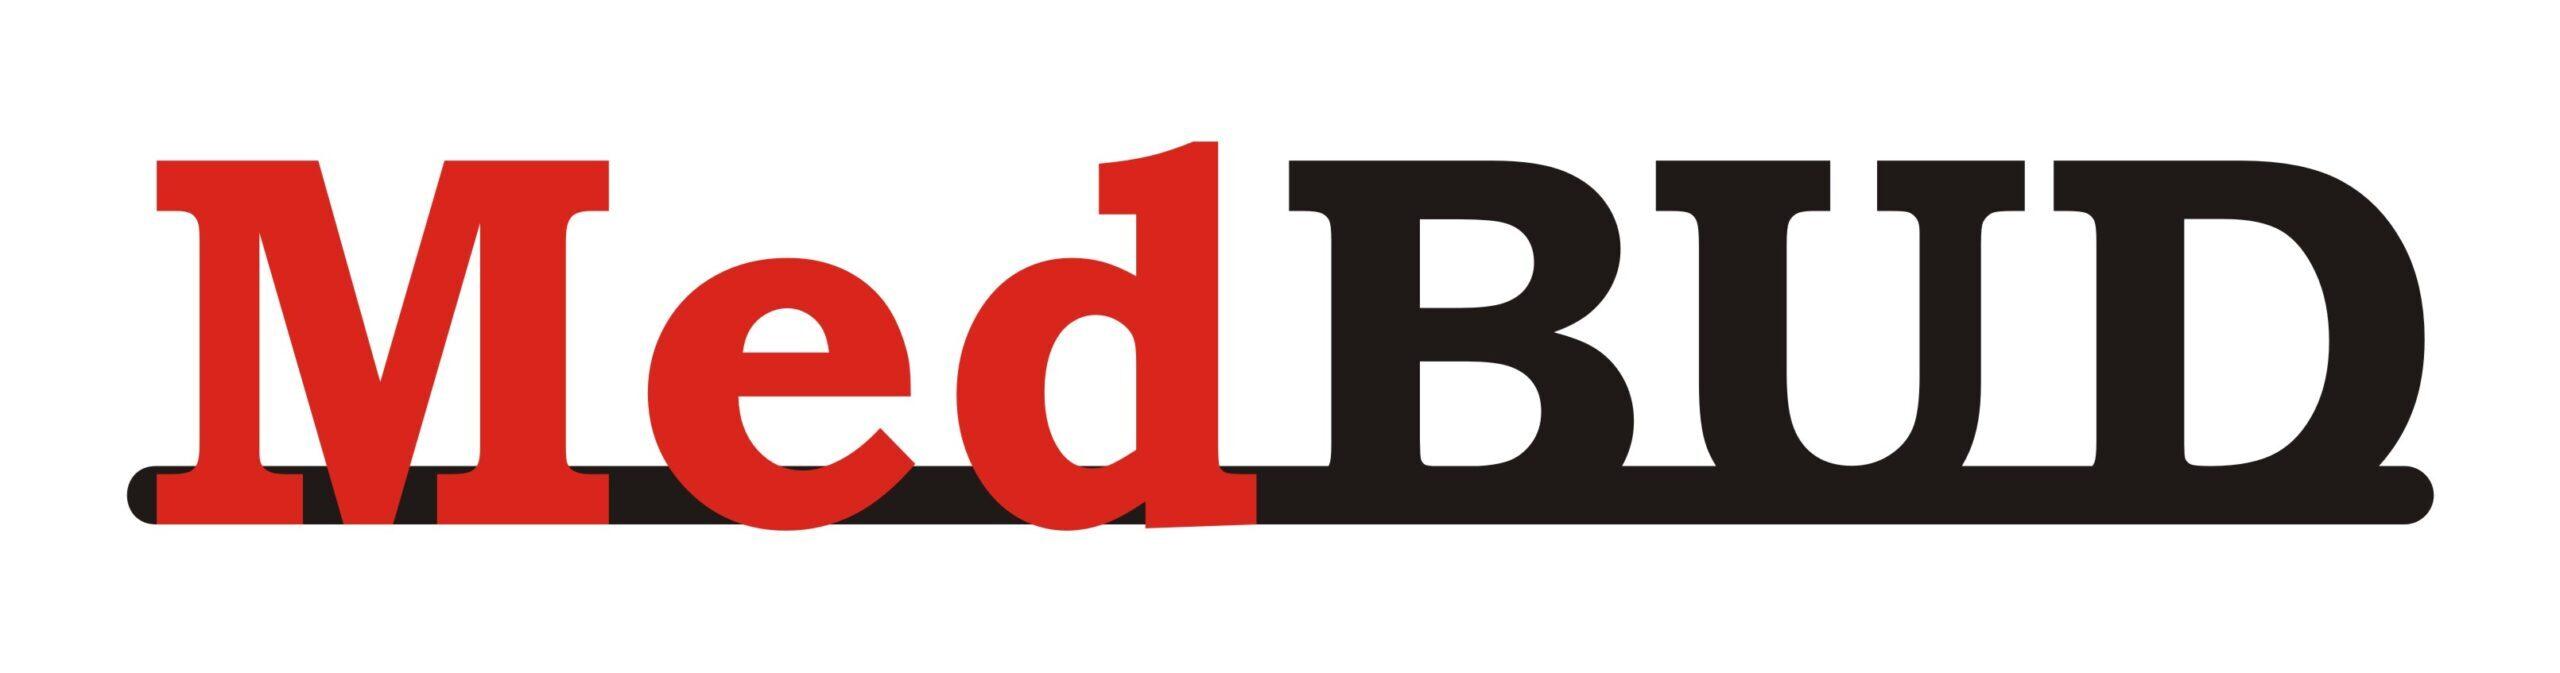 Medbud – Artykuły